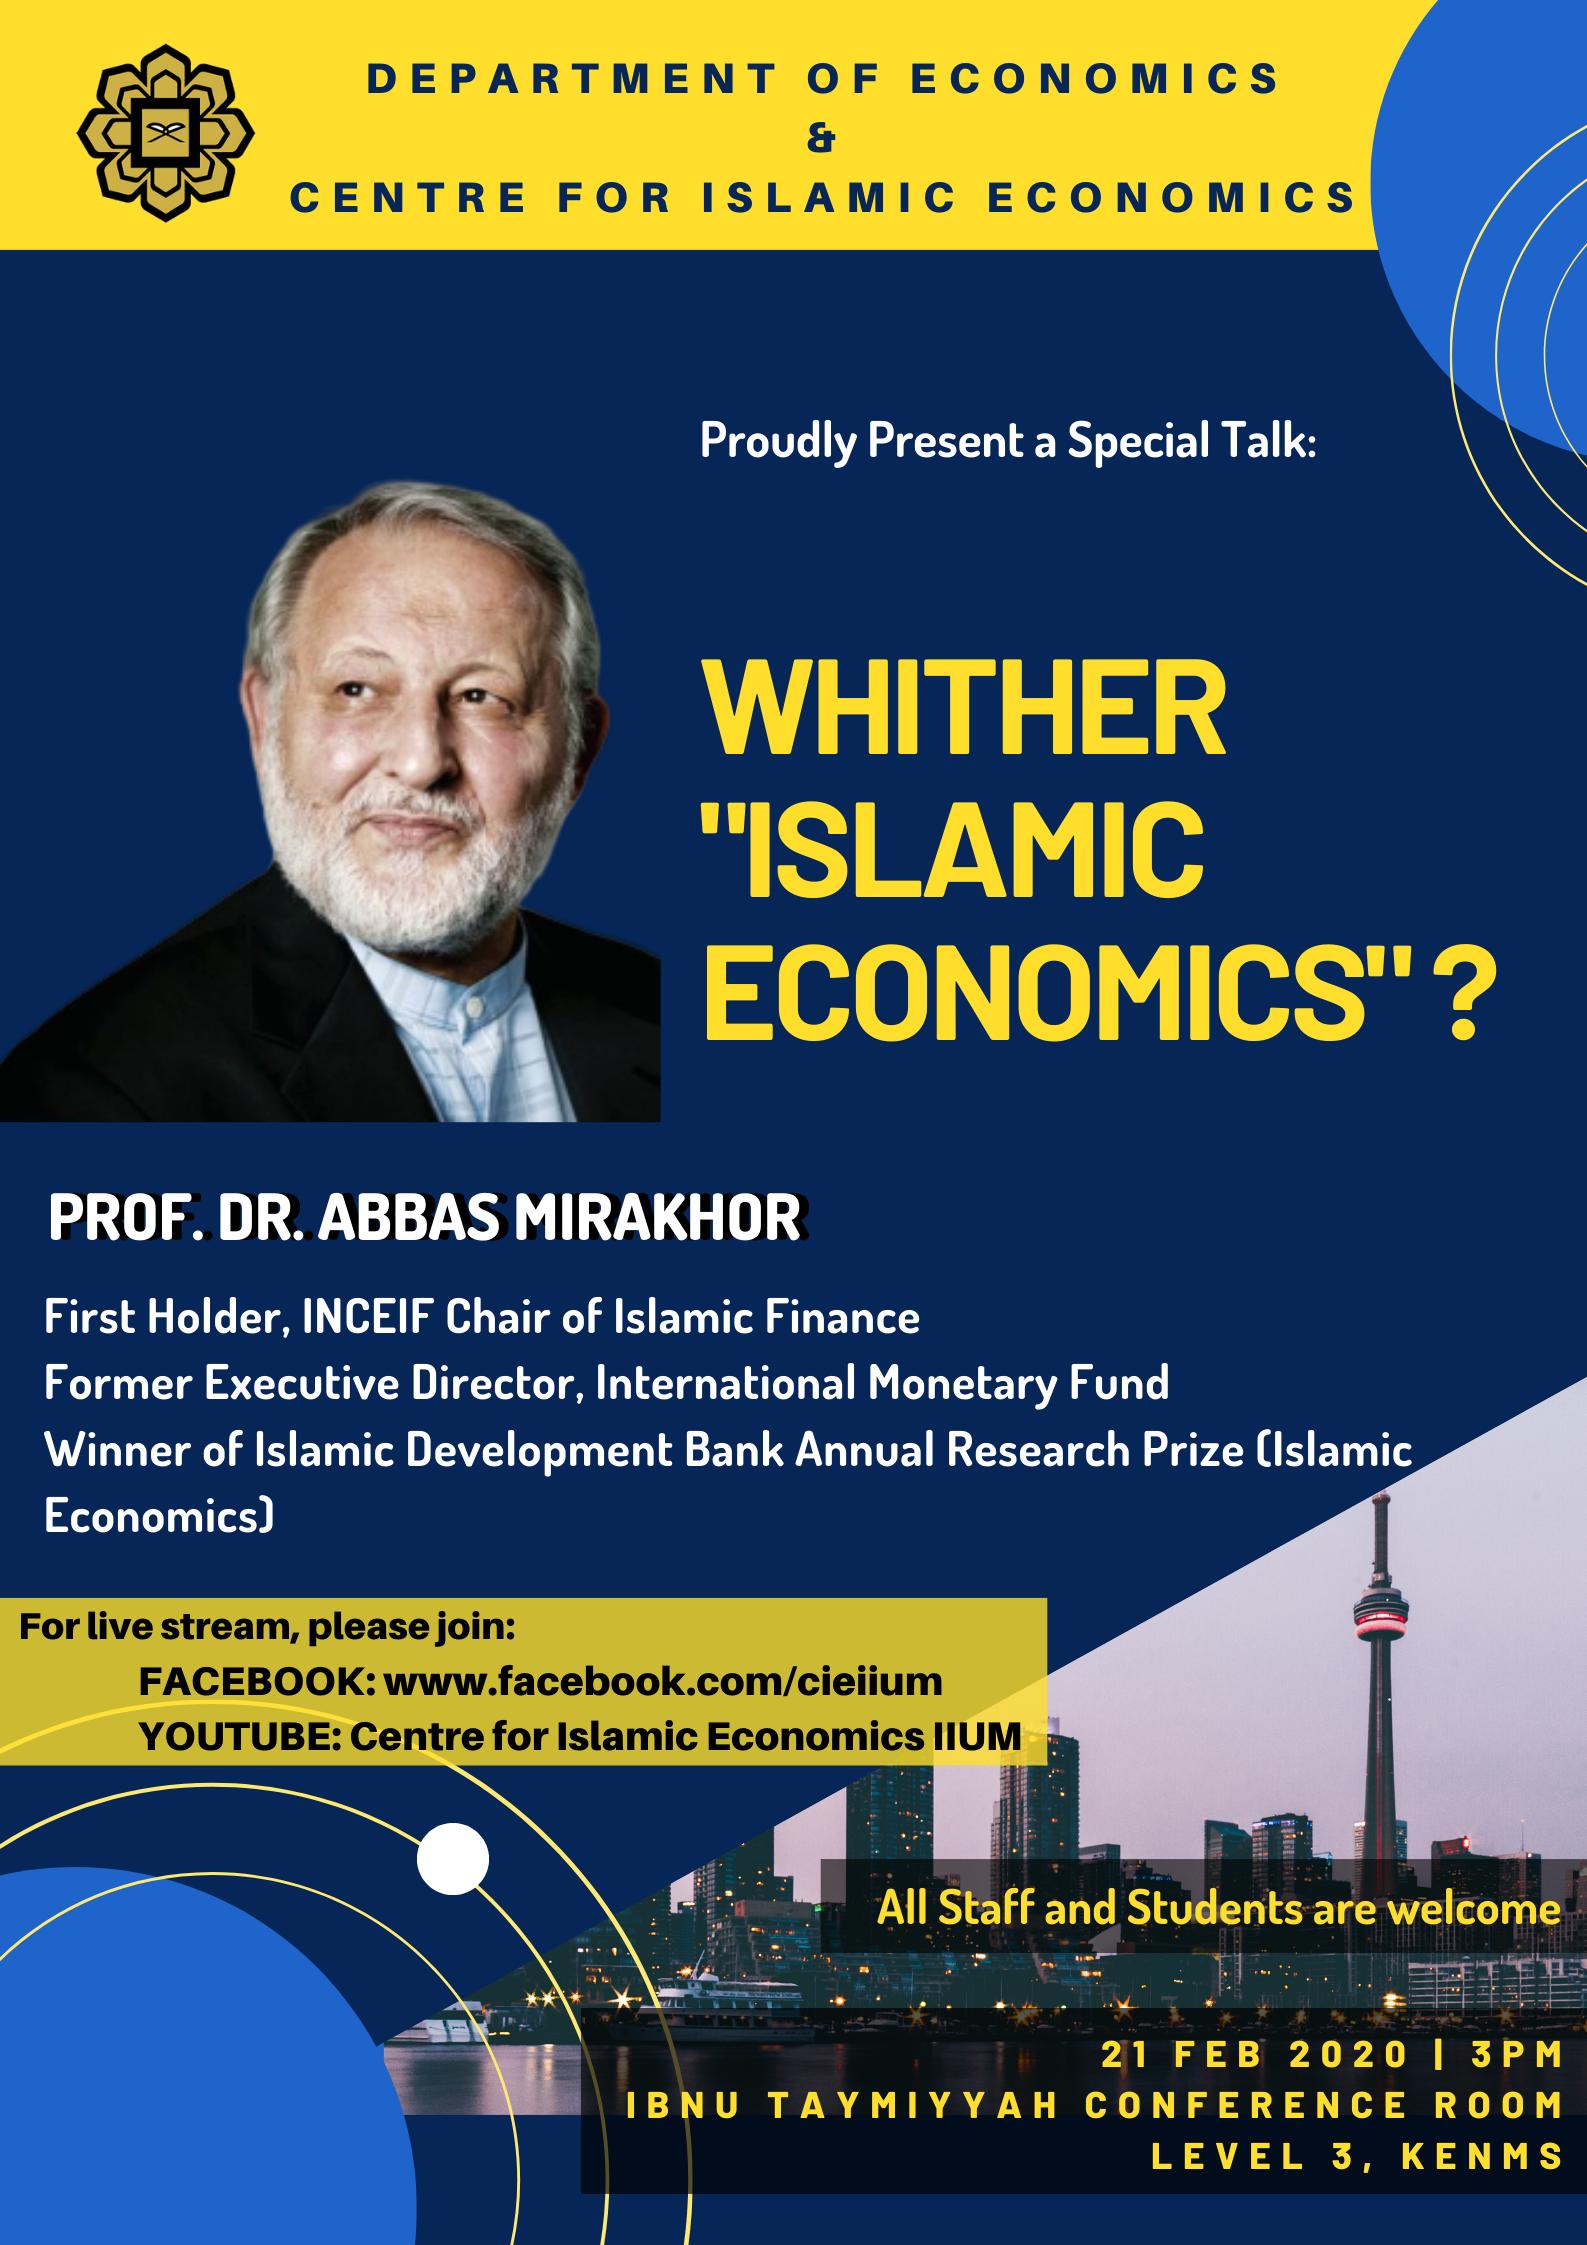 SPECIAL TALK BY PROF. DR. ABBAS MIRAKHOR